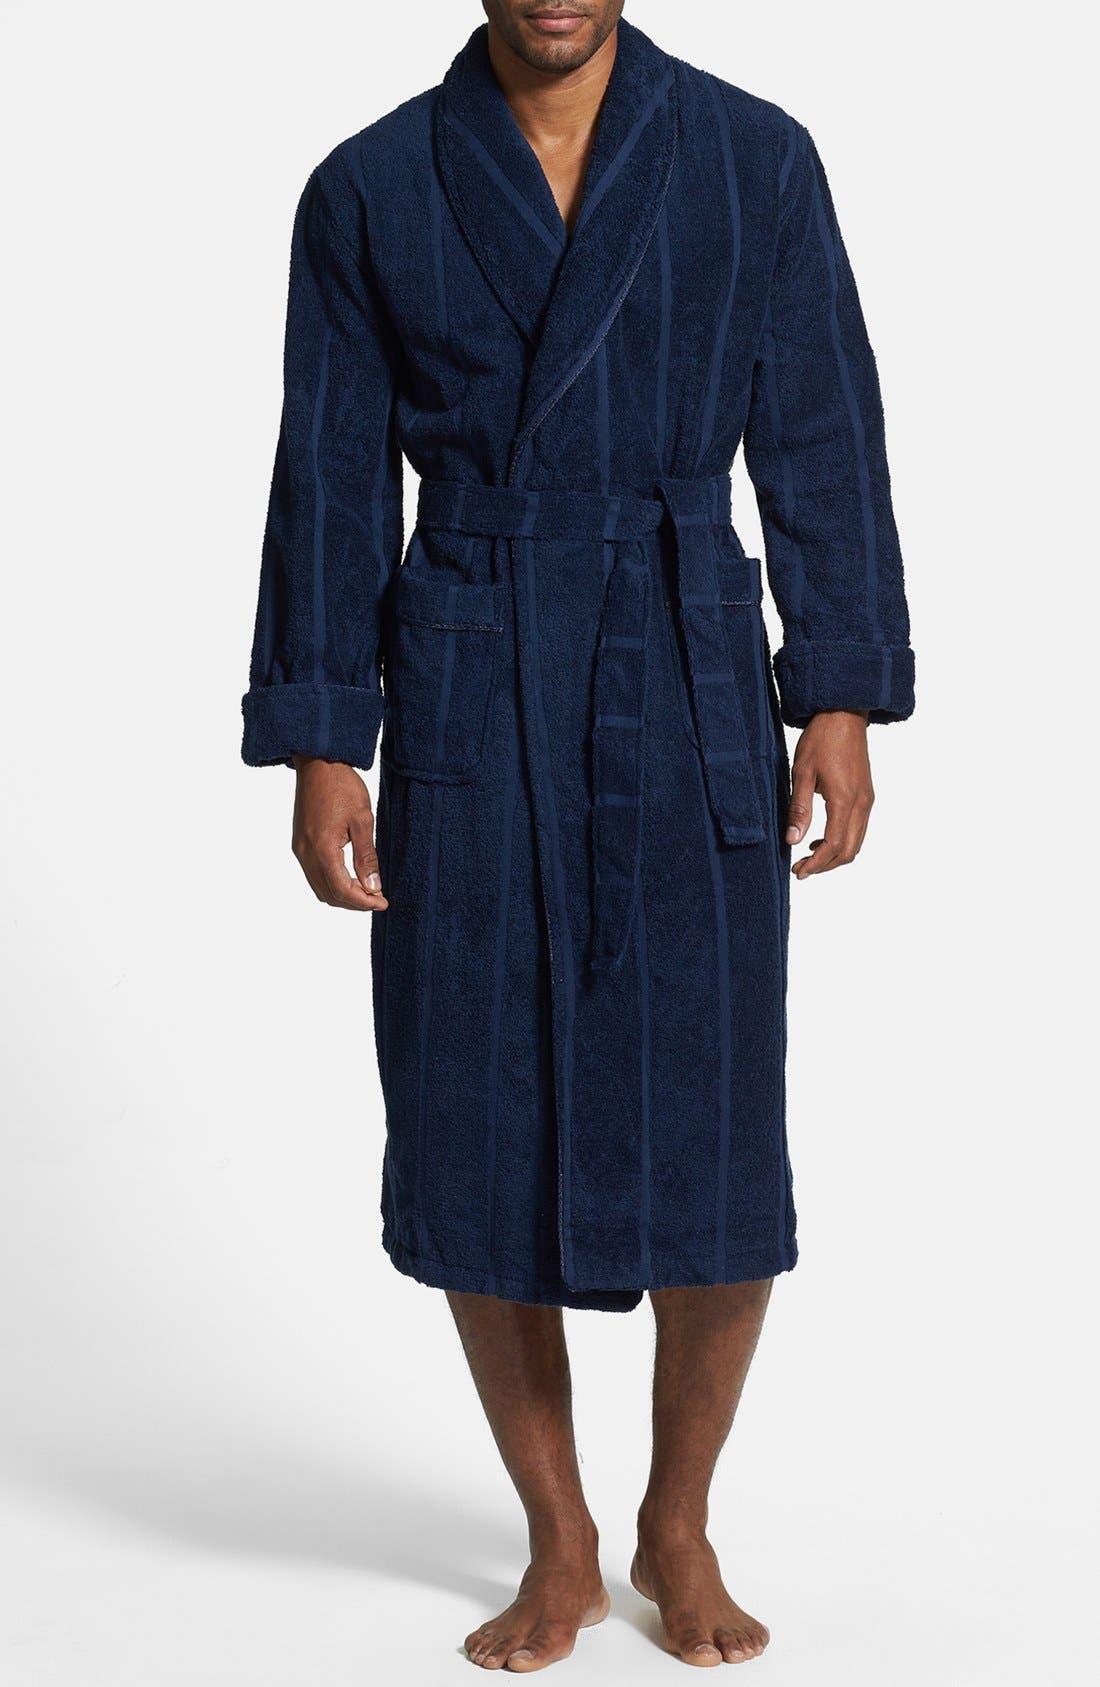 059794475402. Men s Majestic International  Ultra Lux  Robe Marine ... 20db28fe8